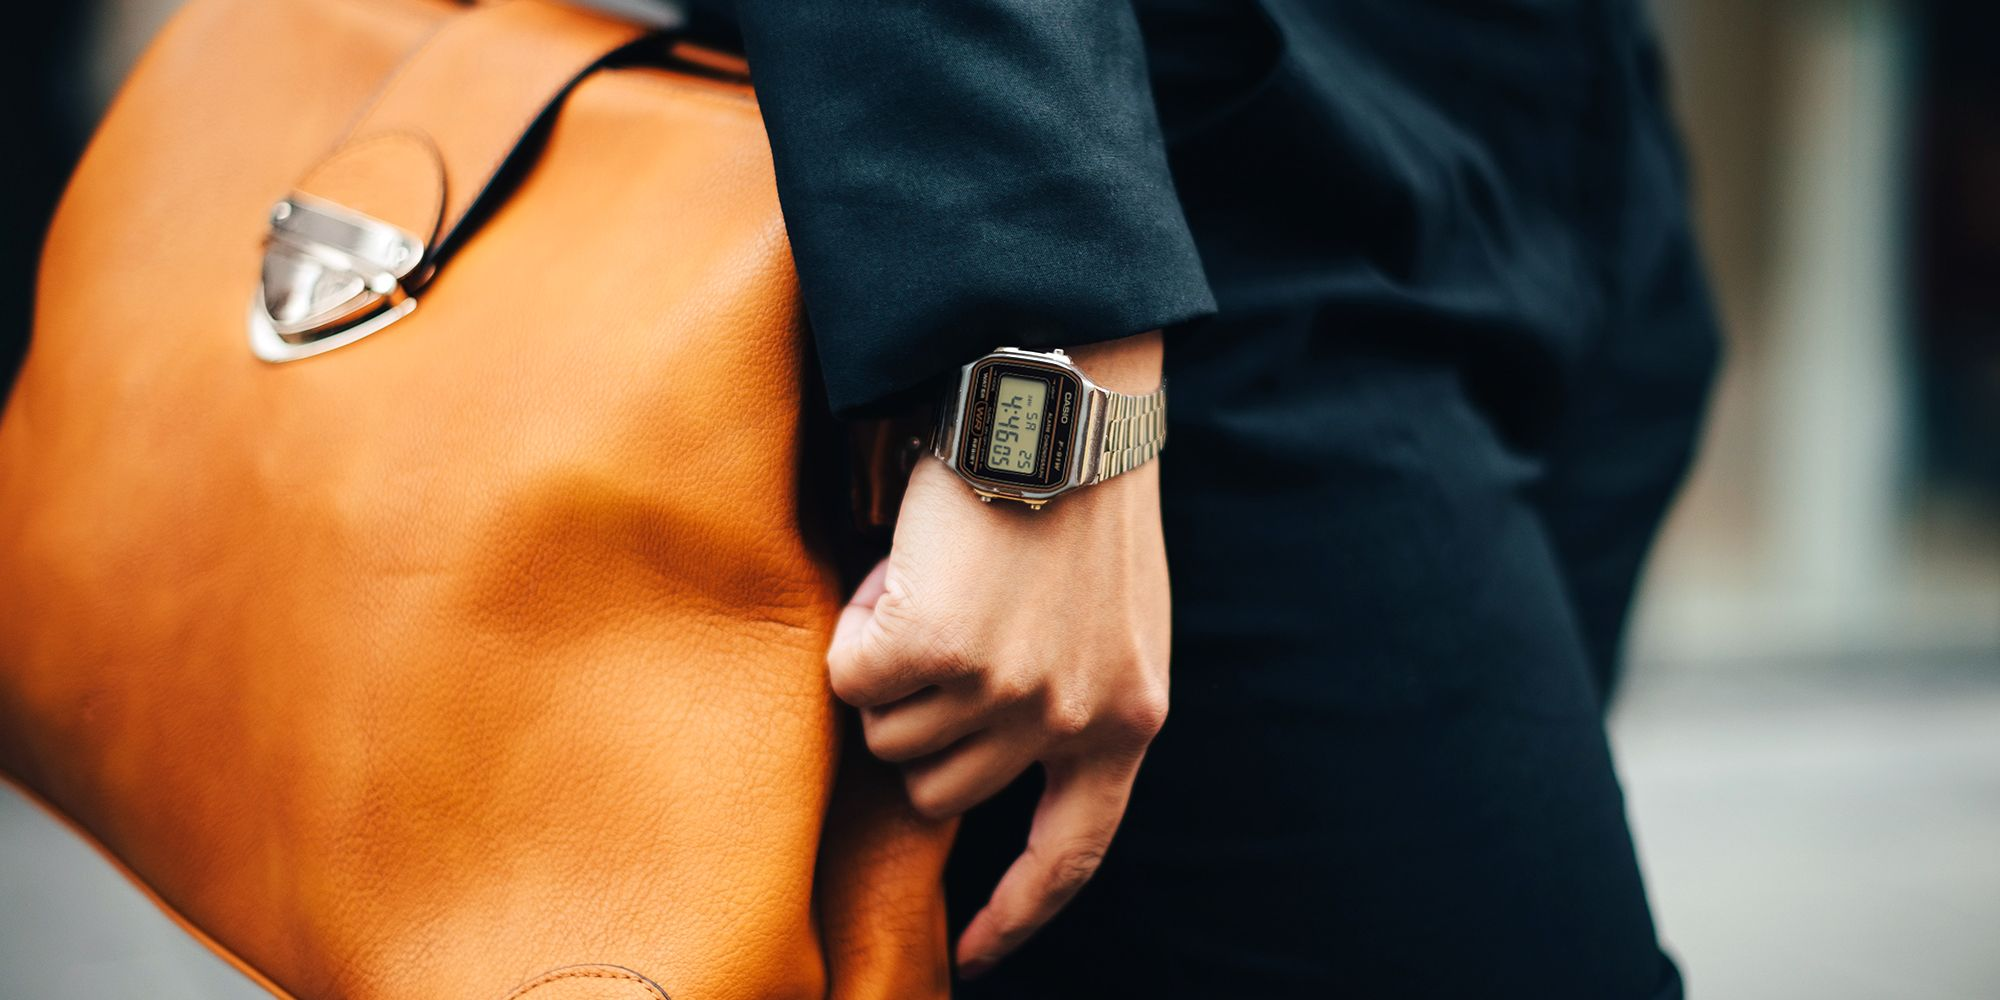 bcdada432 12 Best Digital Watches for Men - Digital Men s Watches to Buy in 2019